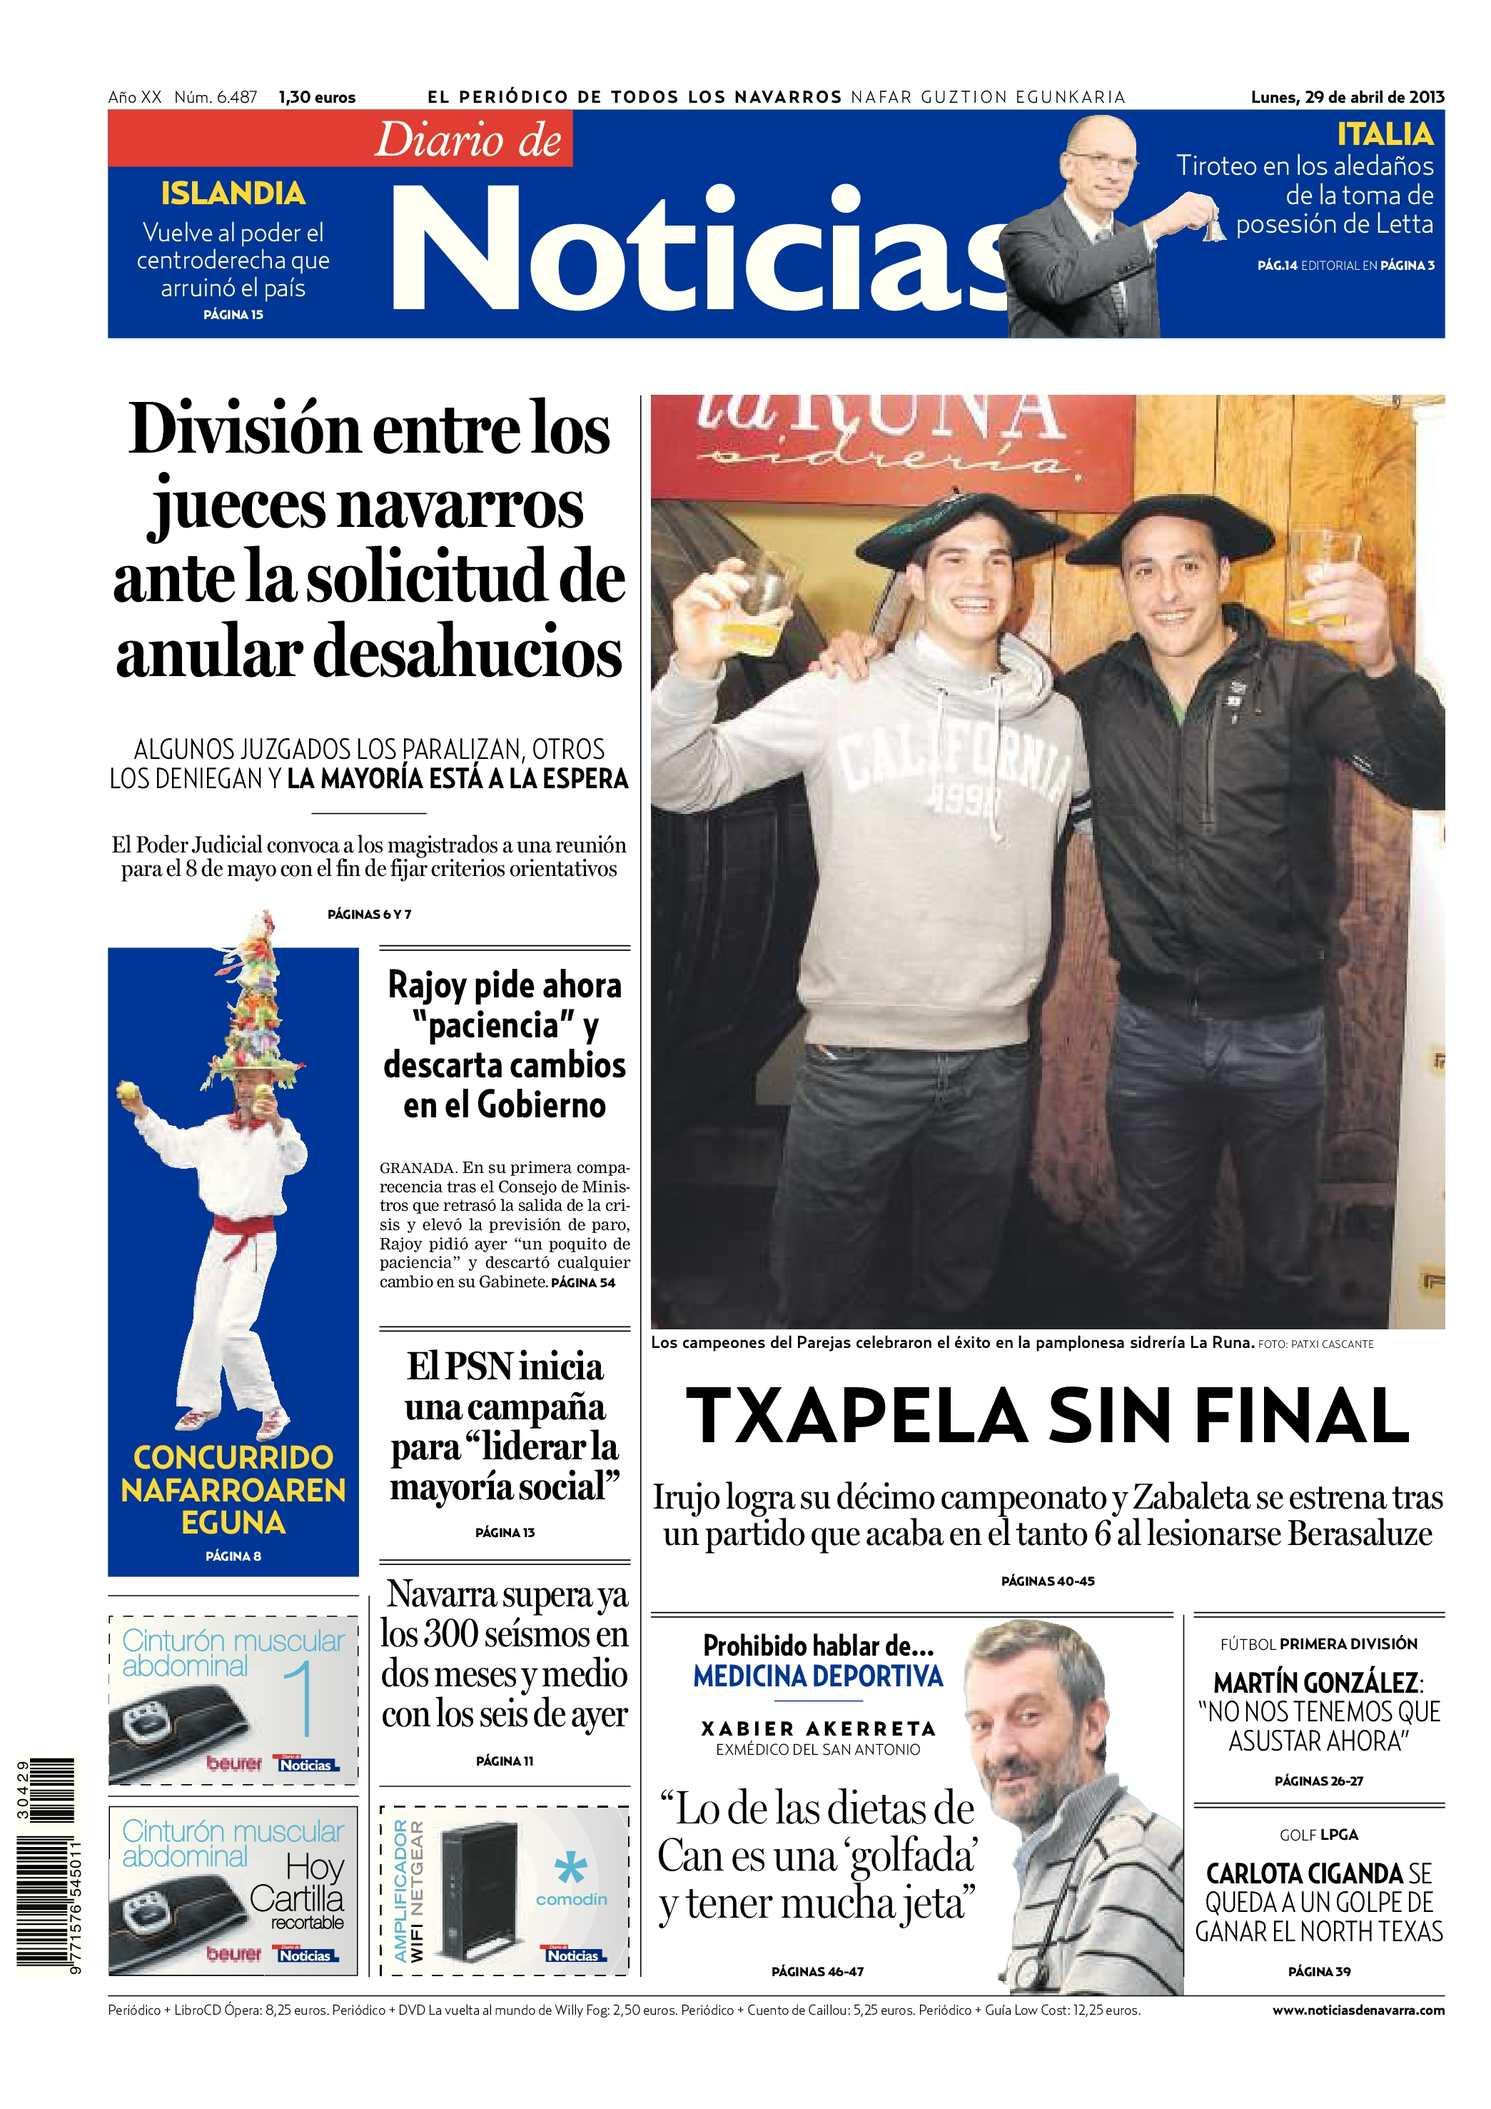 Calaméo - Diario de Noticias 20130429 7bbf7b6abd70f